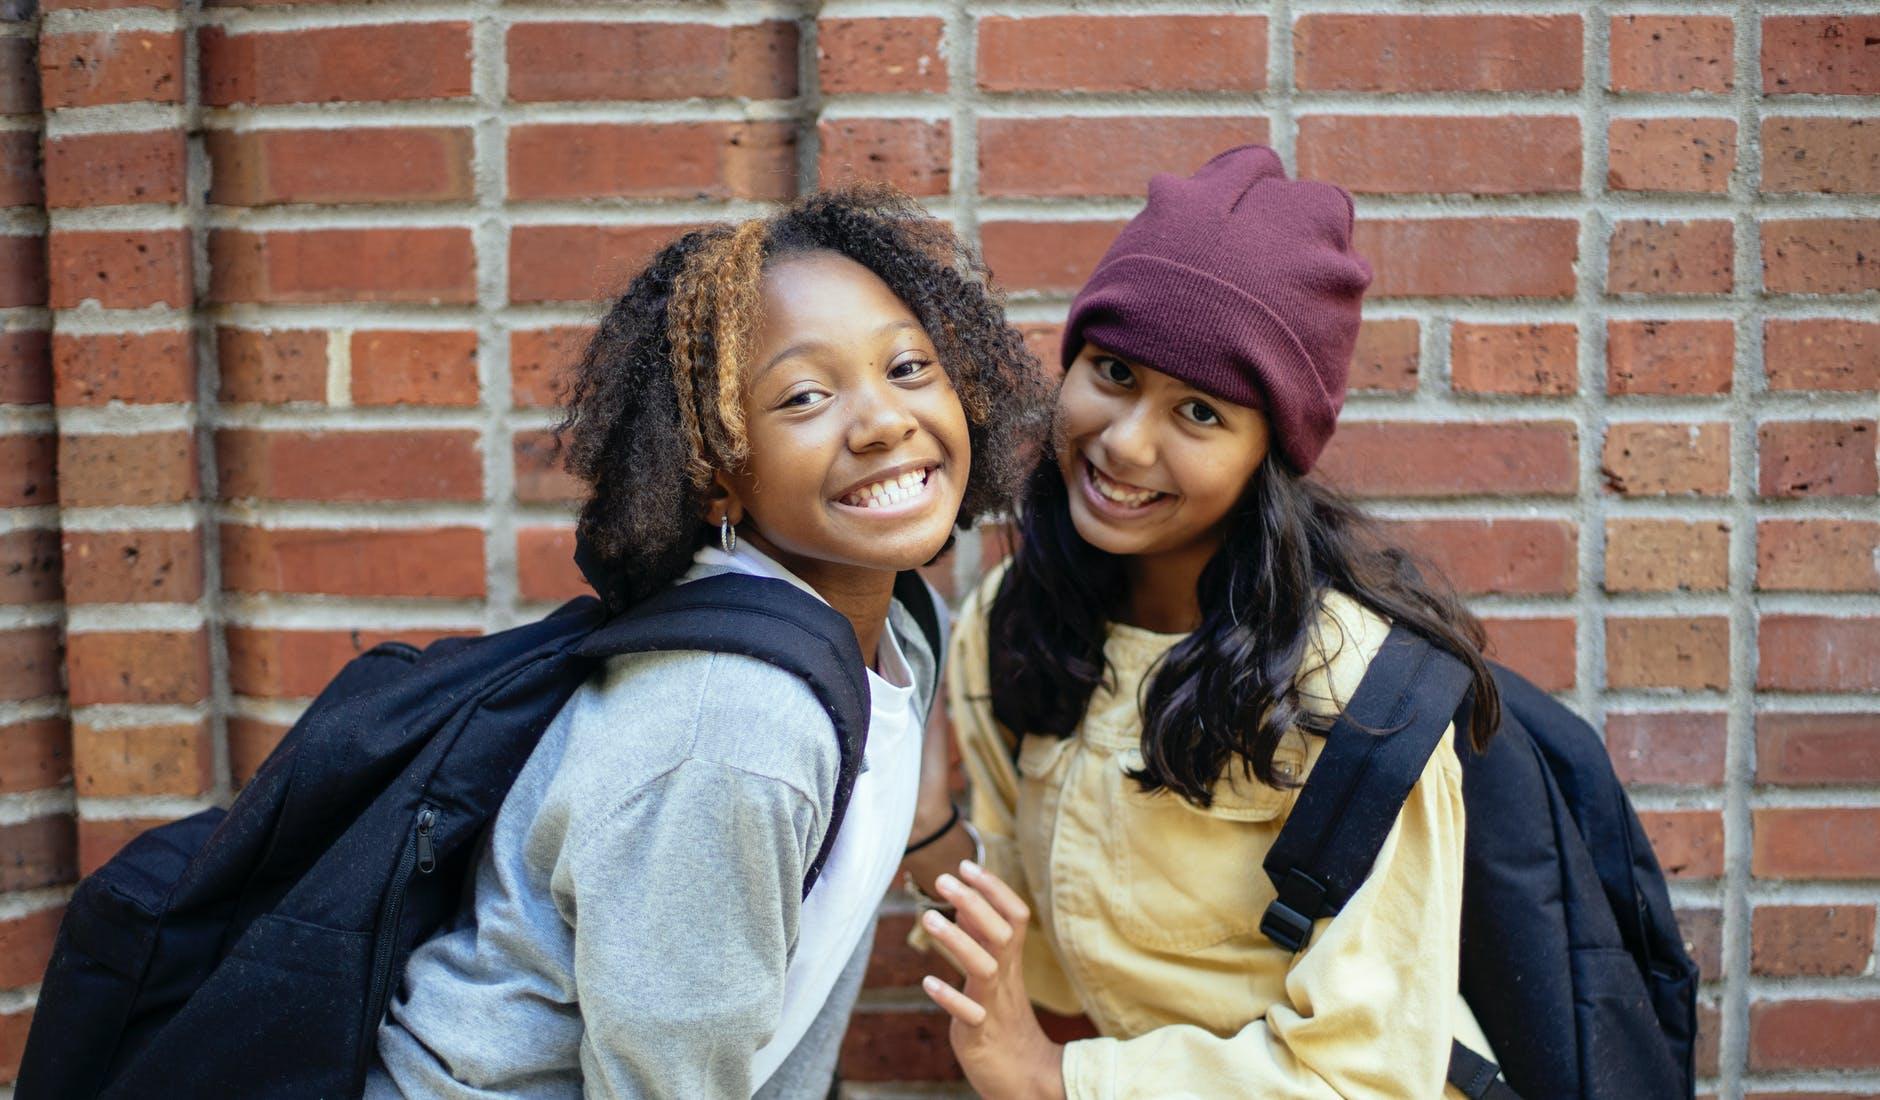 smiling diverse schoolgirls with rucksacks near brick wall